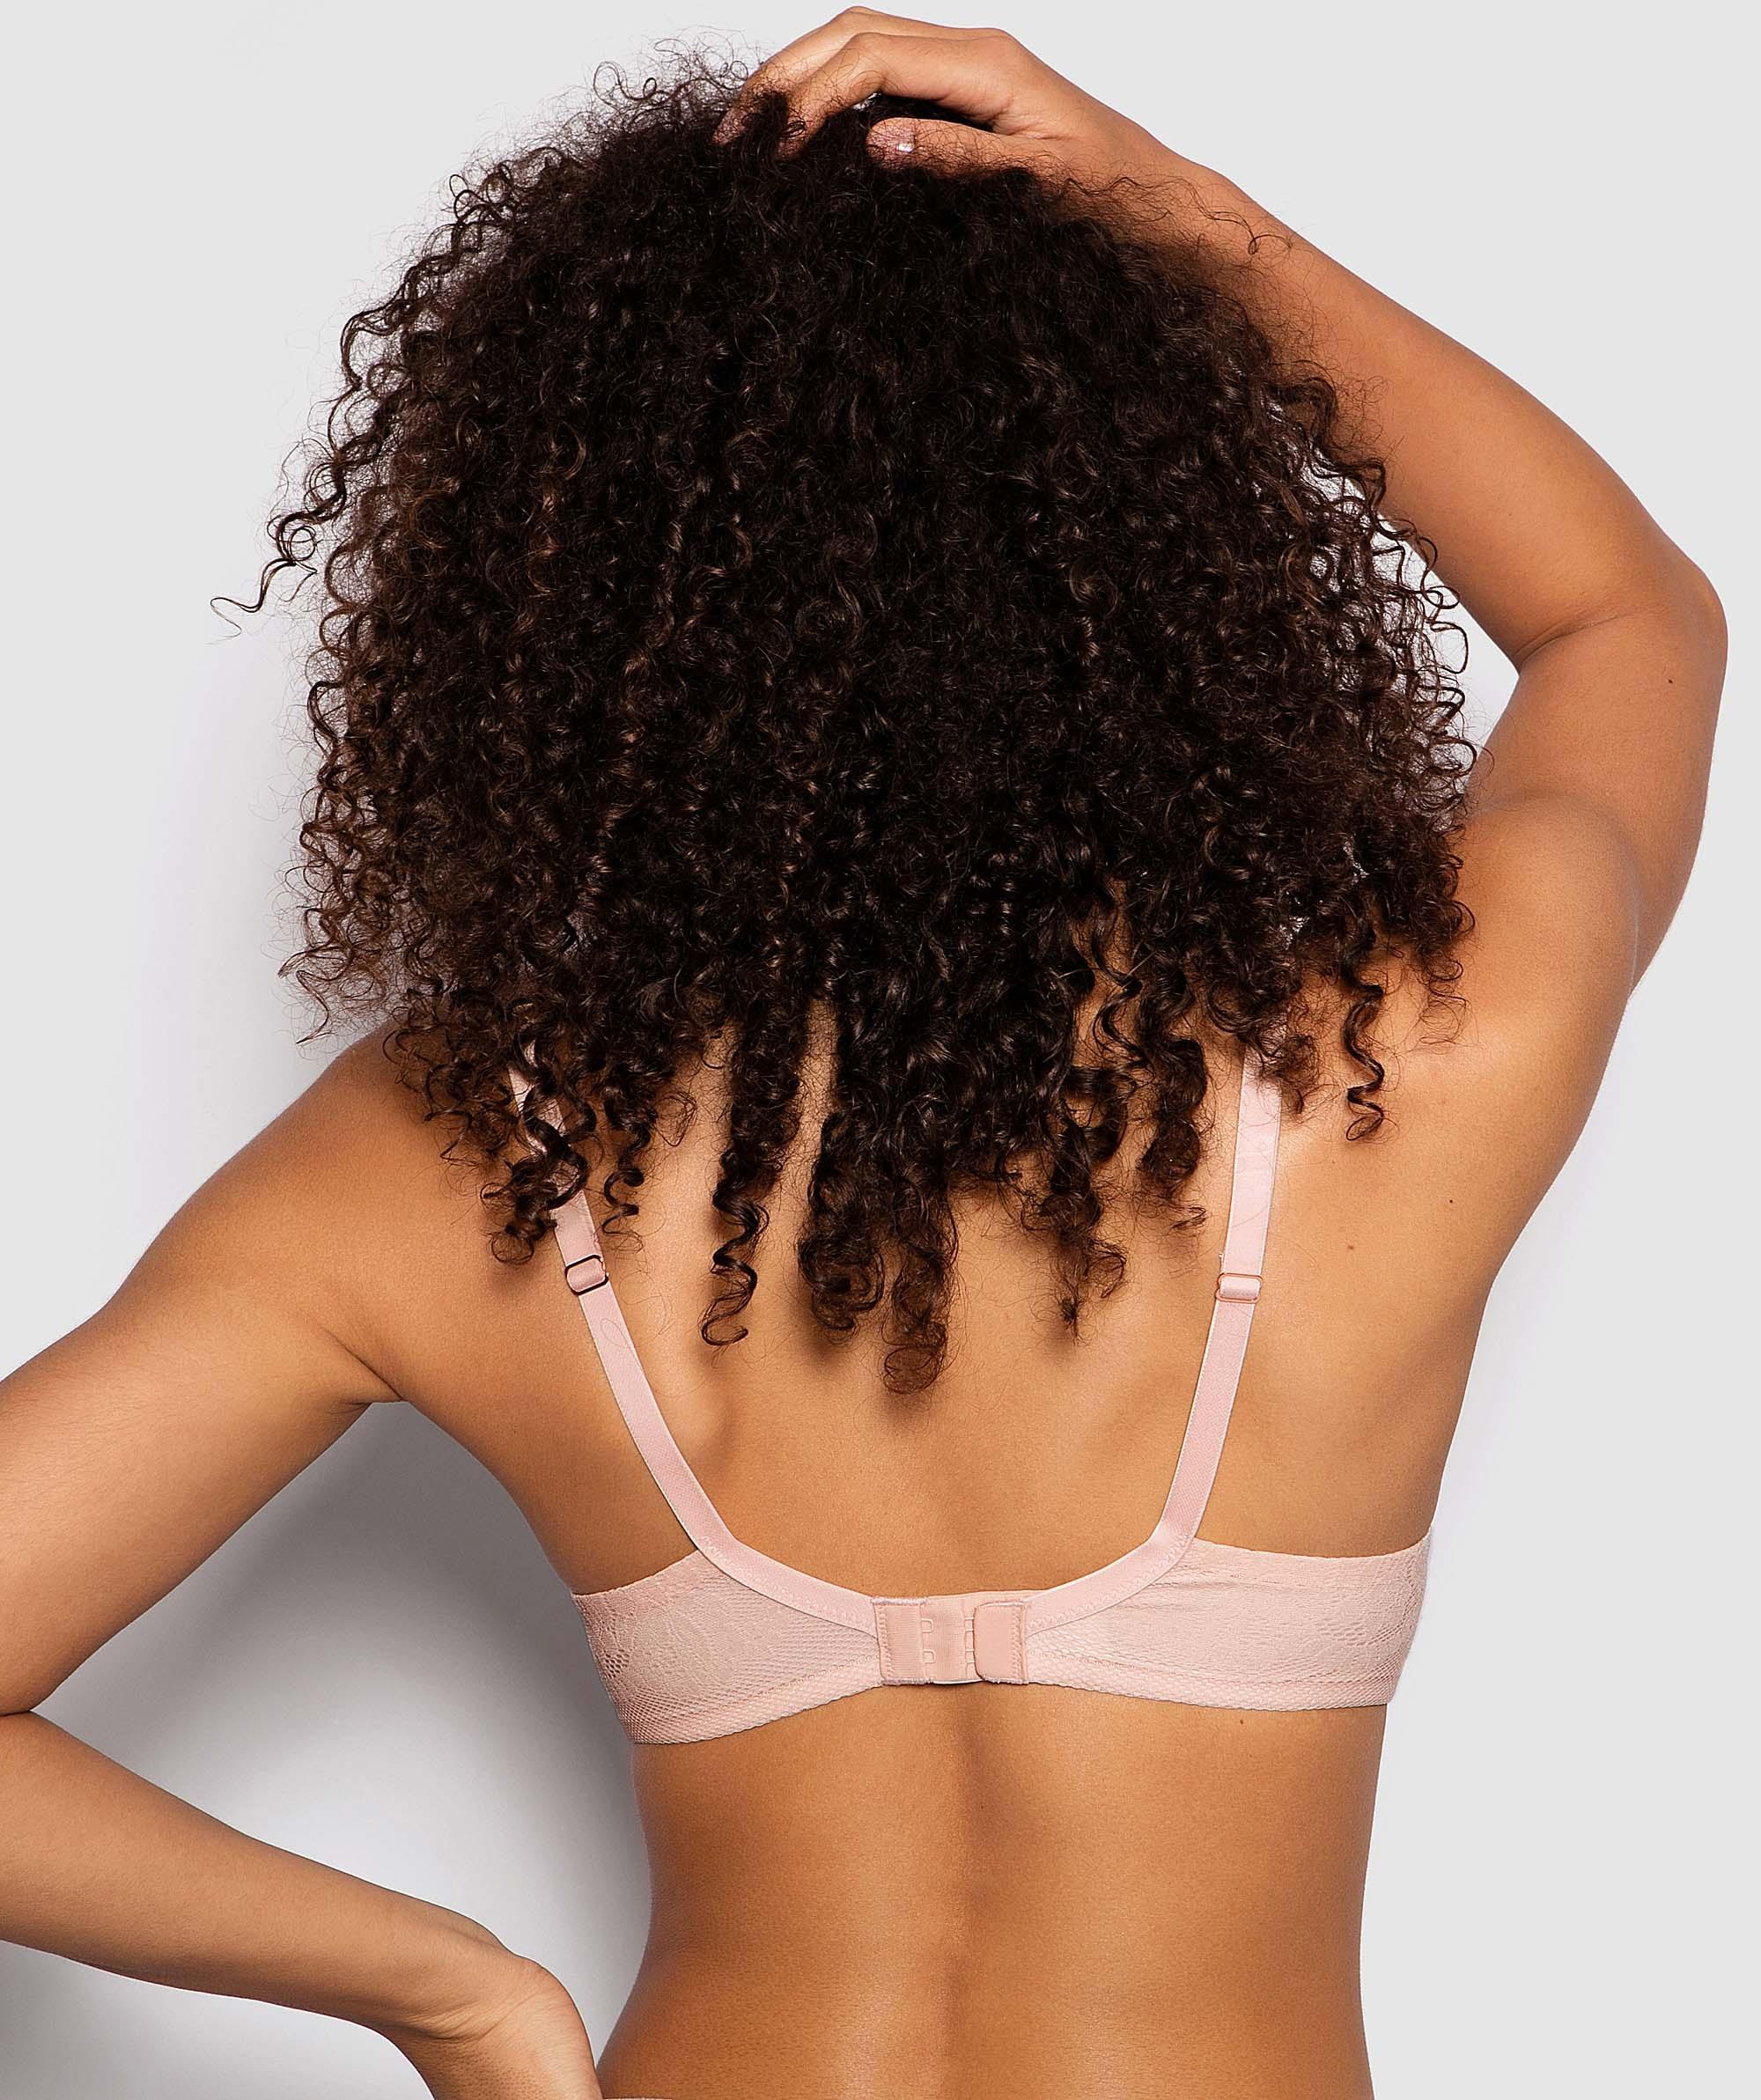 Pure Body Contour Bra - Blush Pink